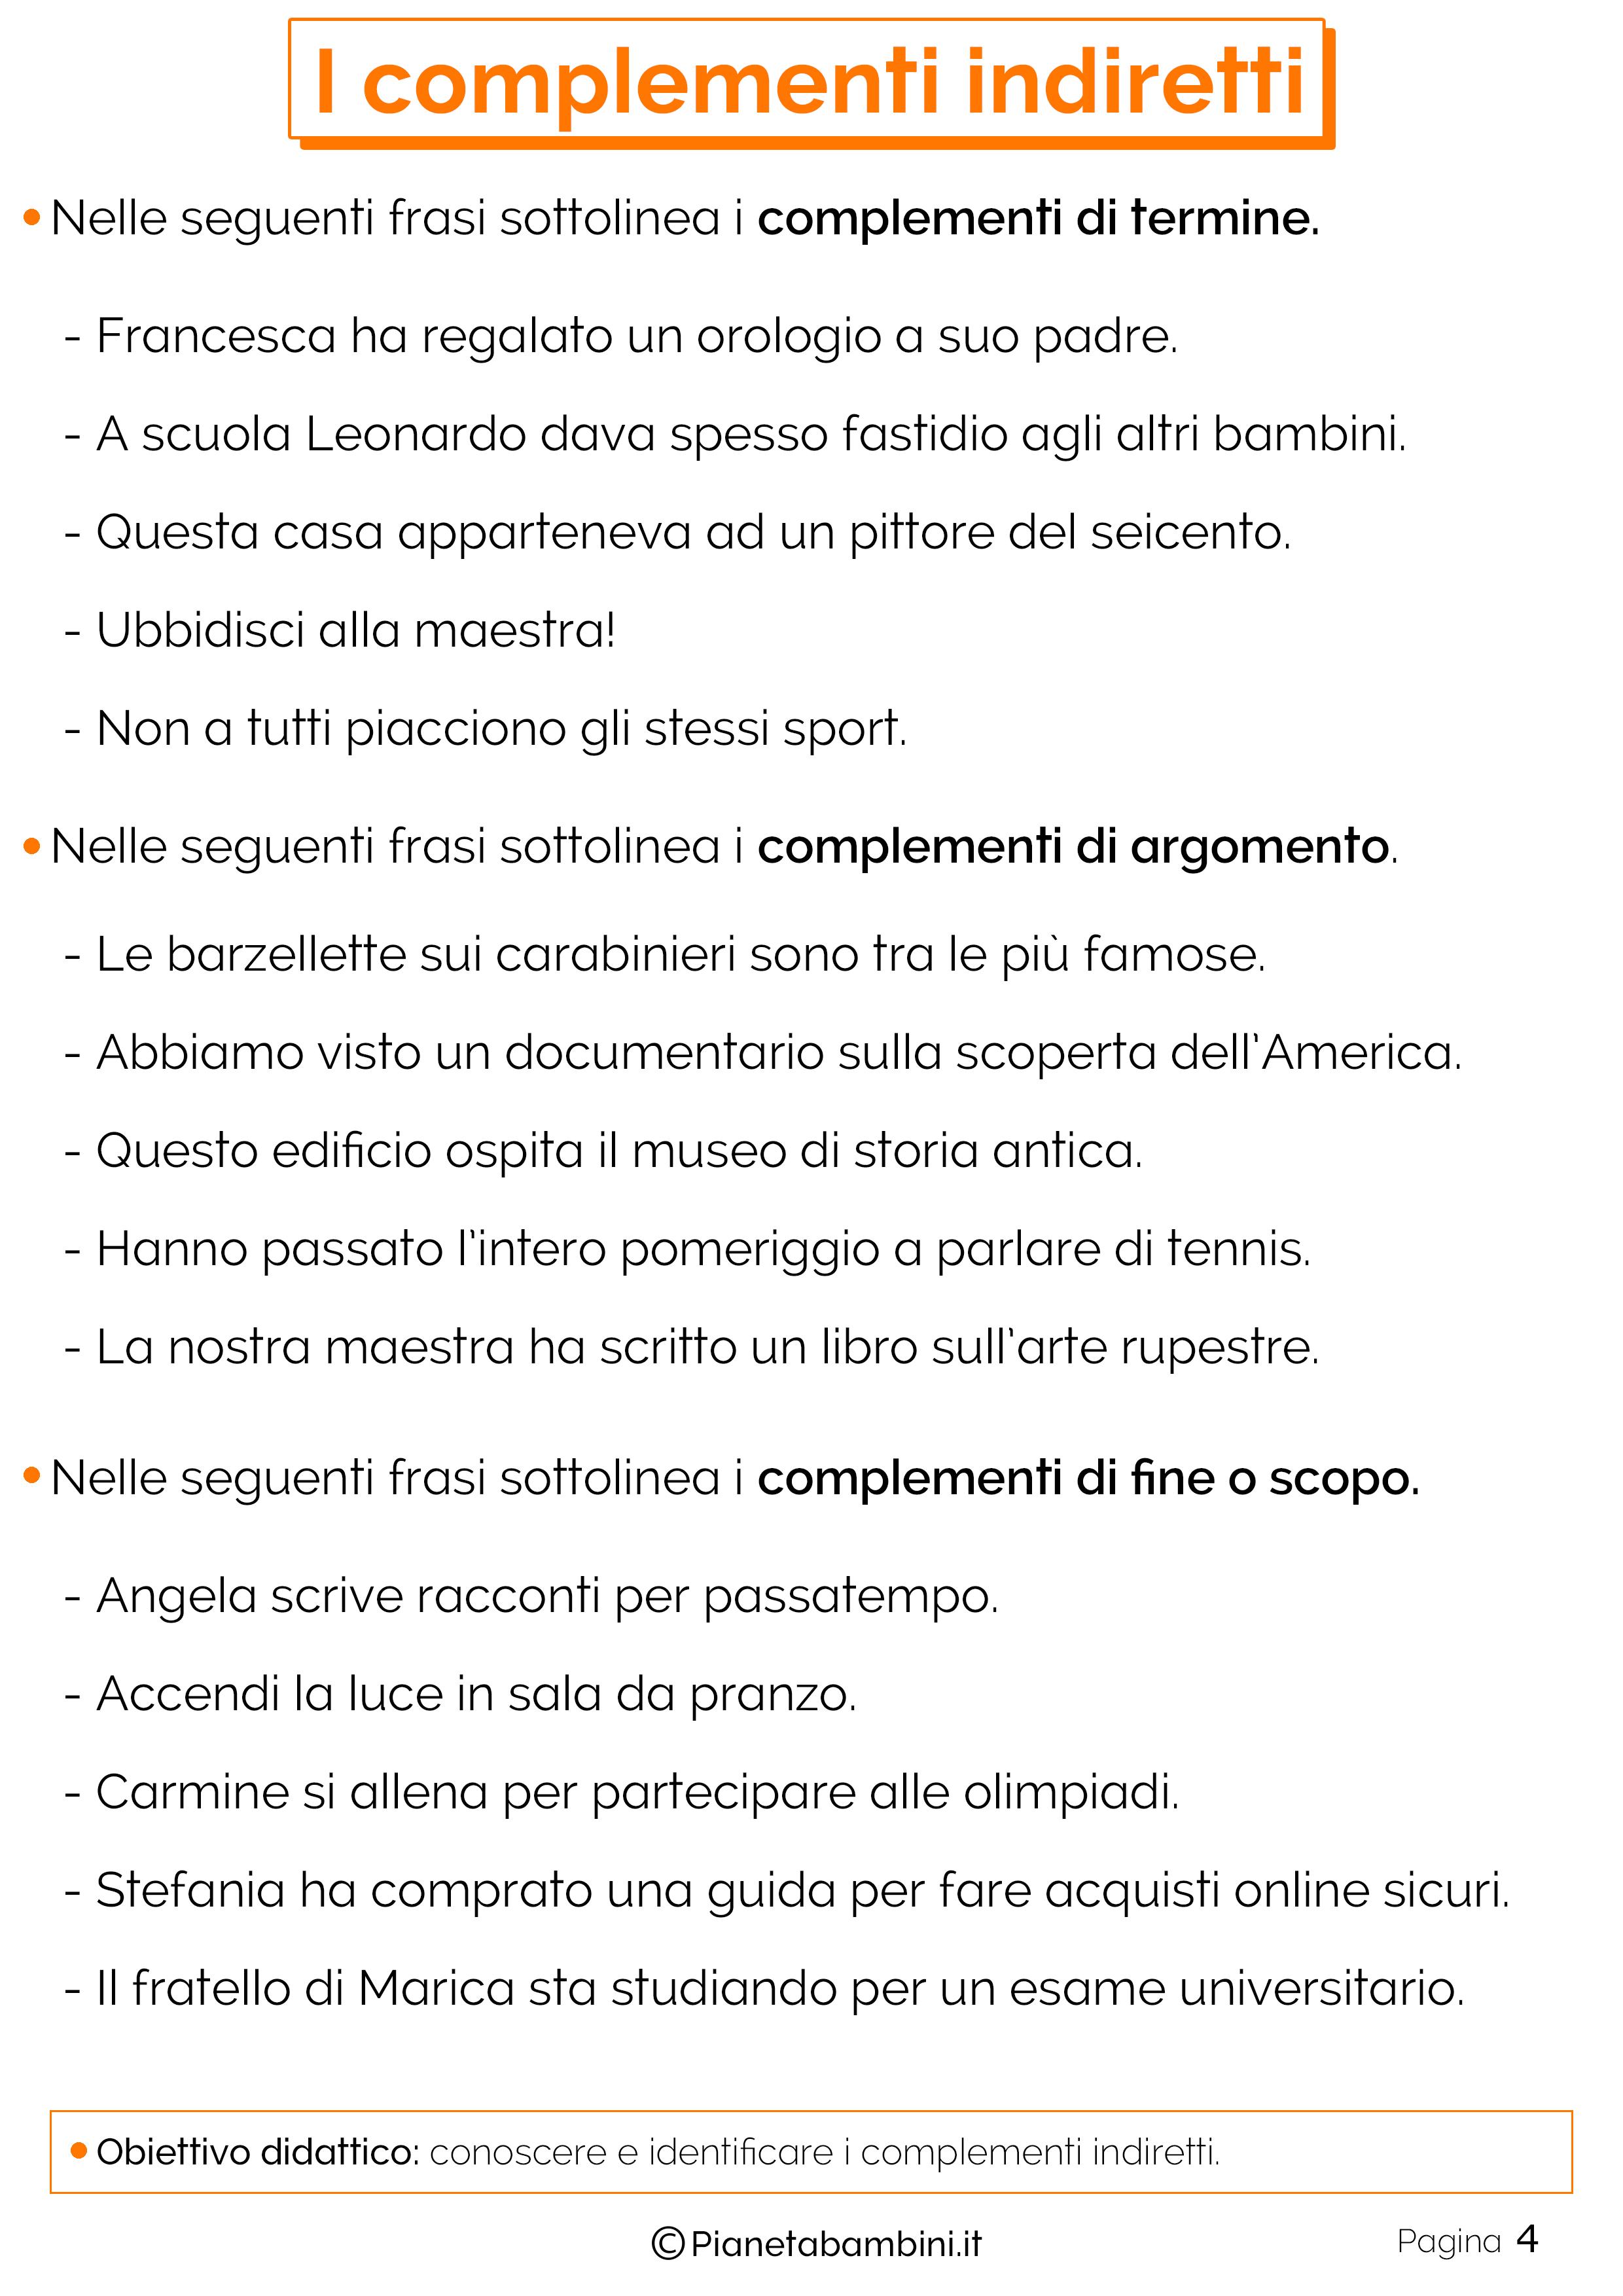 Esercizi sui complementi indiretti n.4